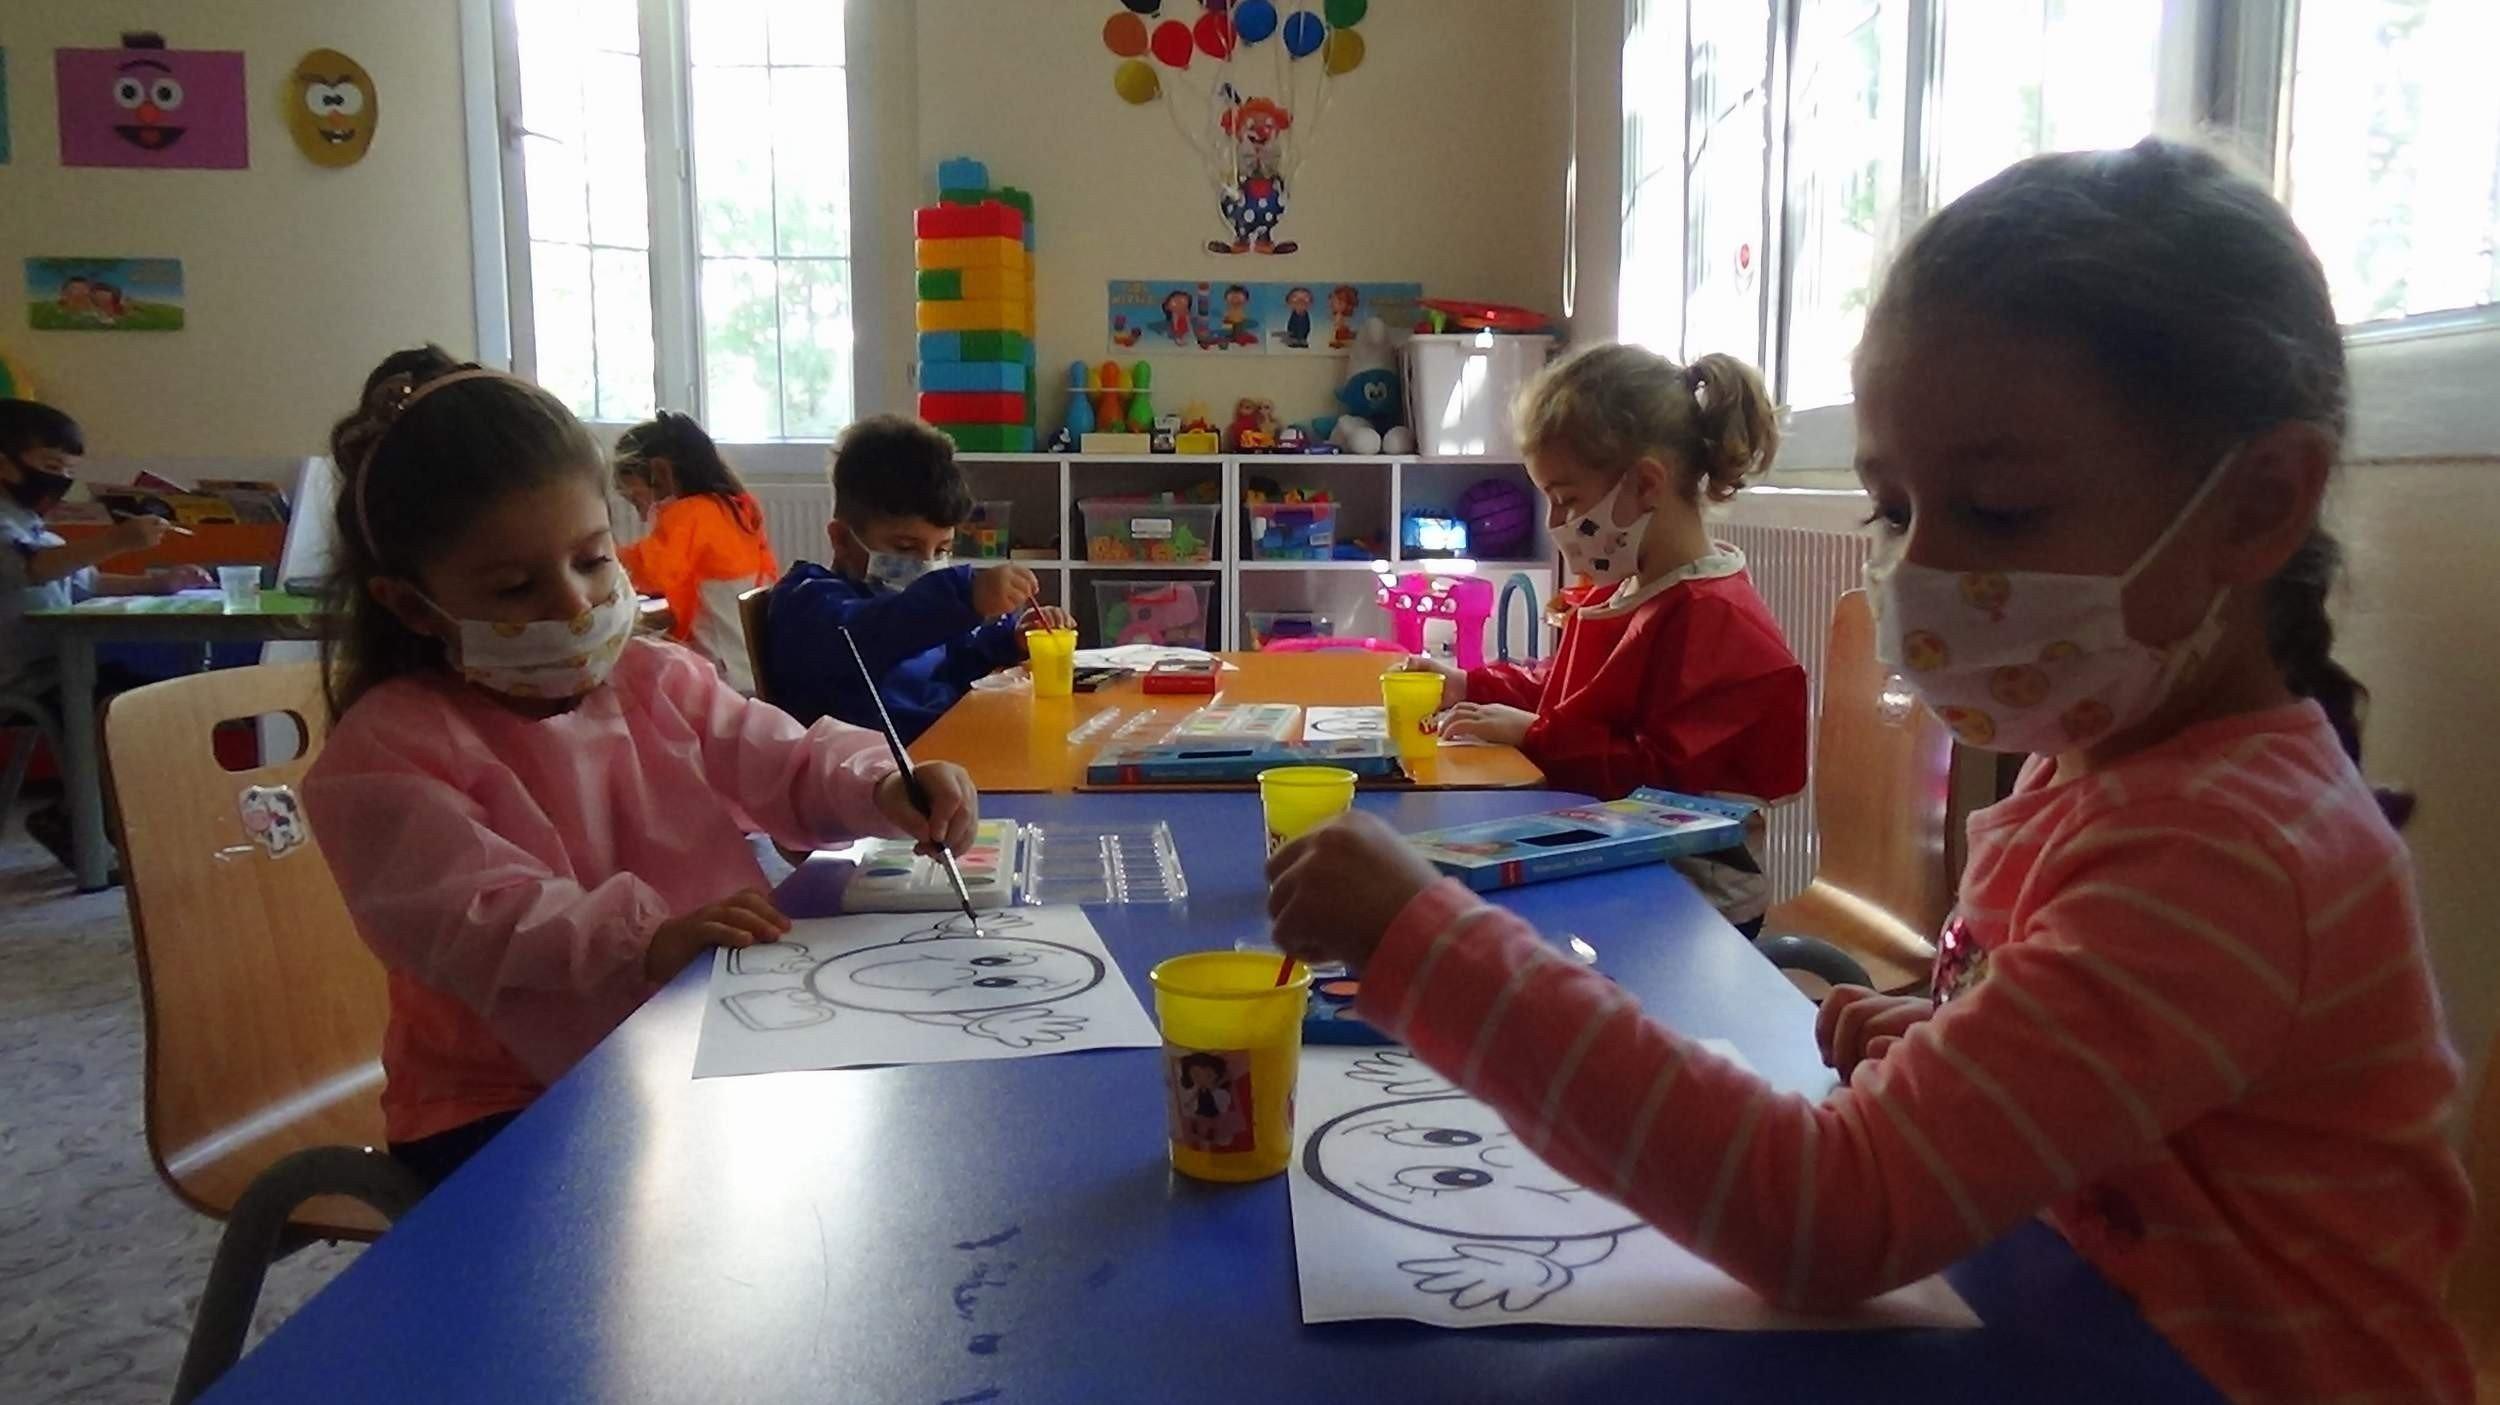 Top expert says virus risk higher for children not at school in Turkey